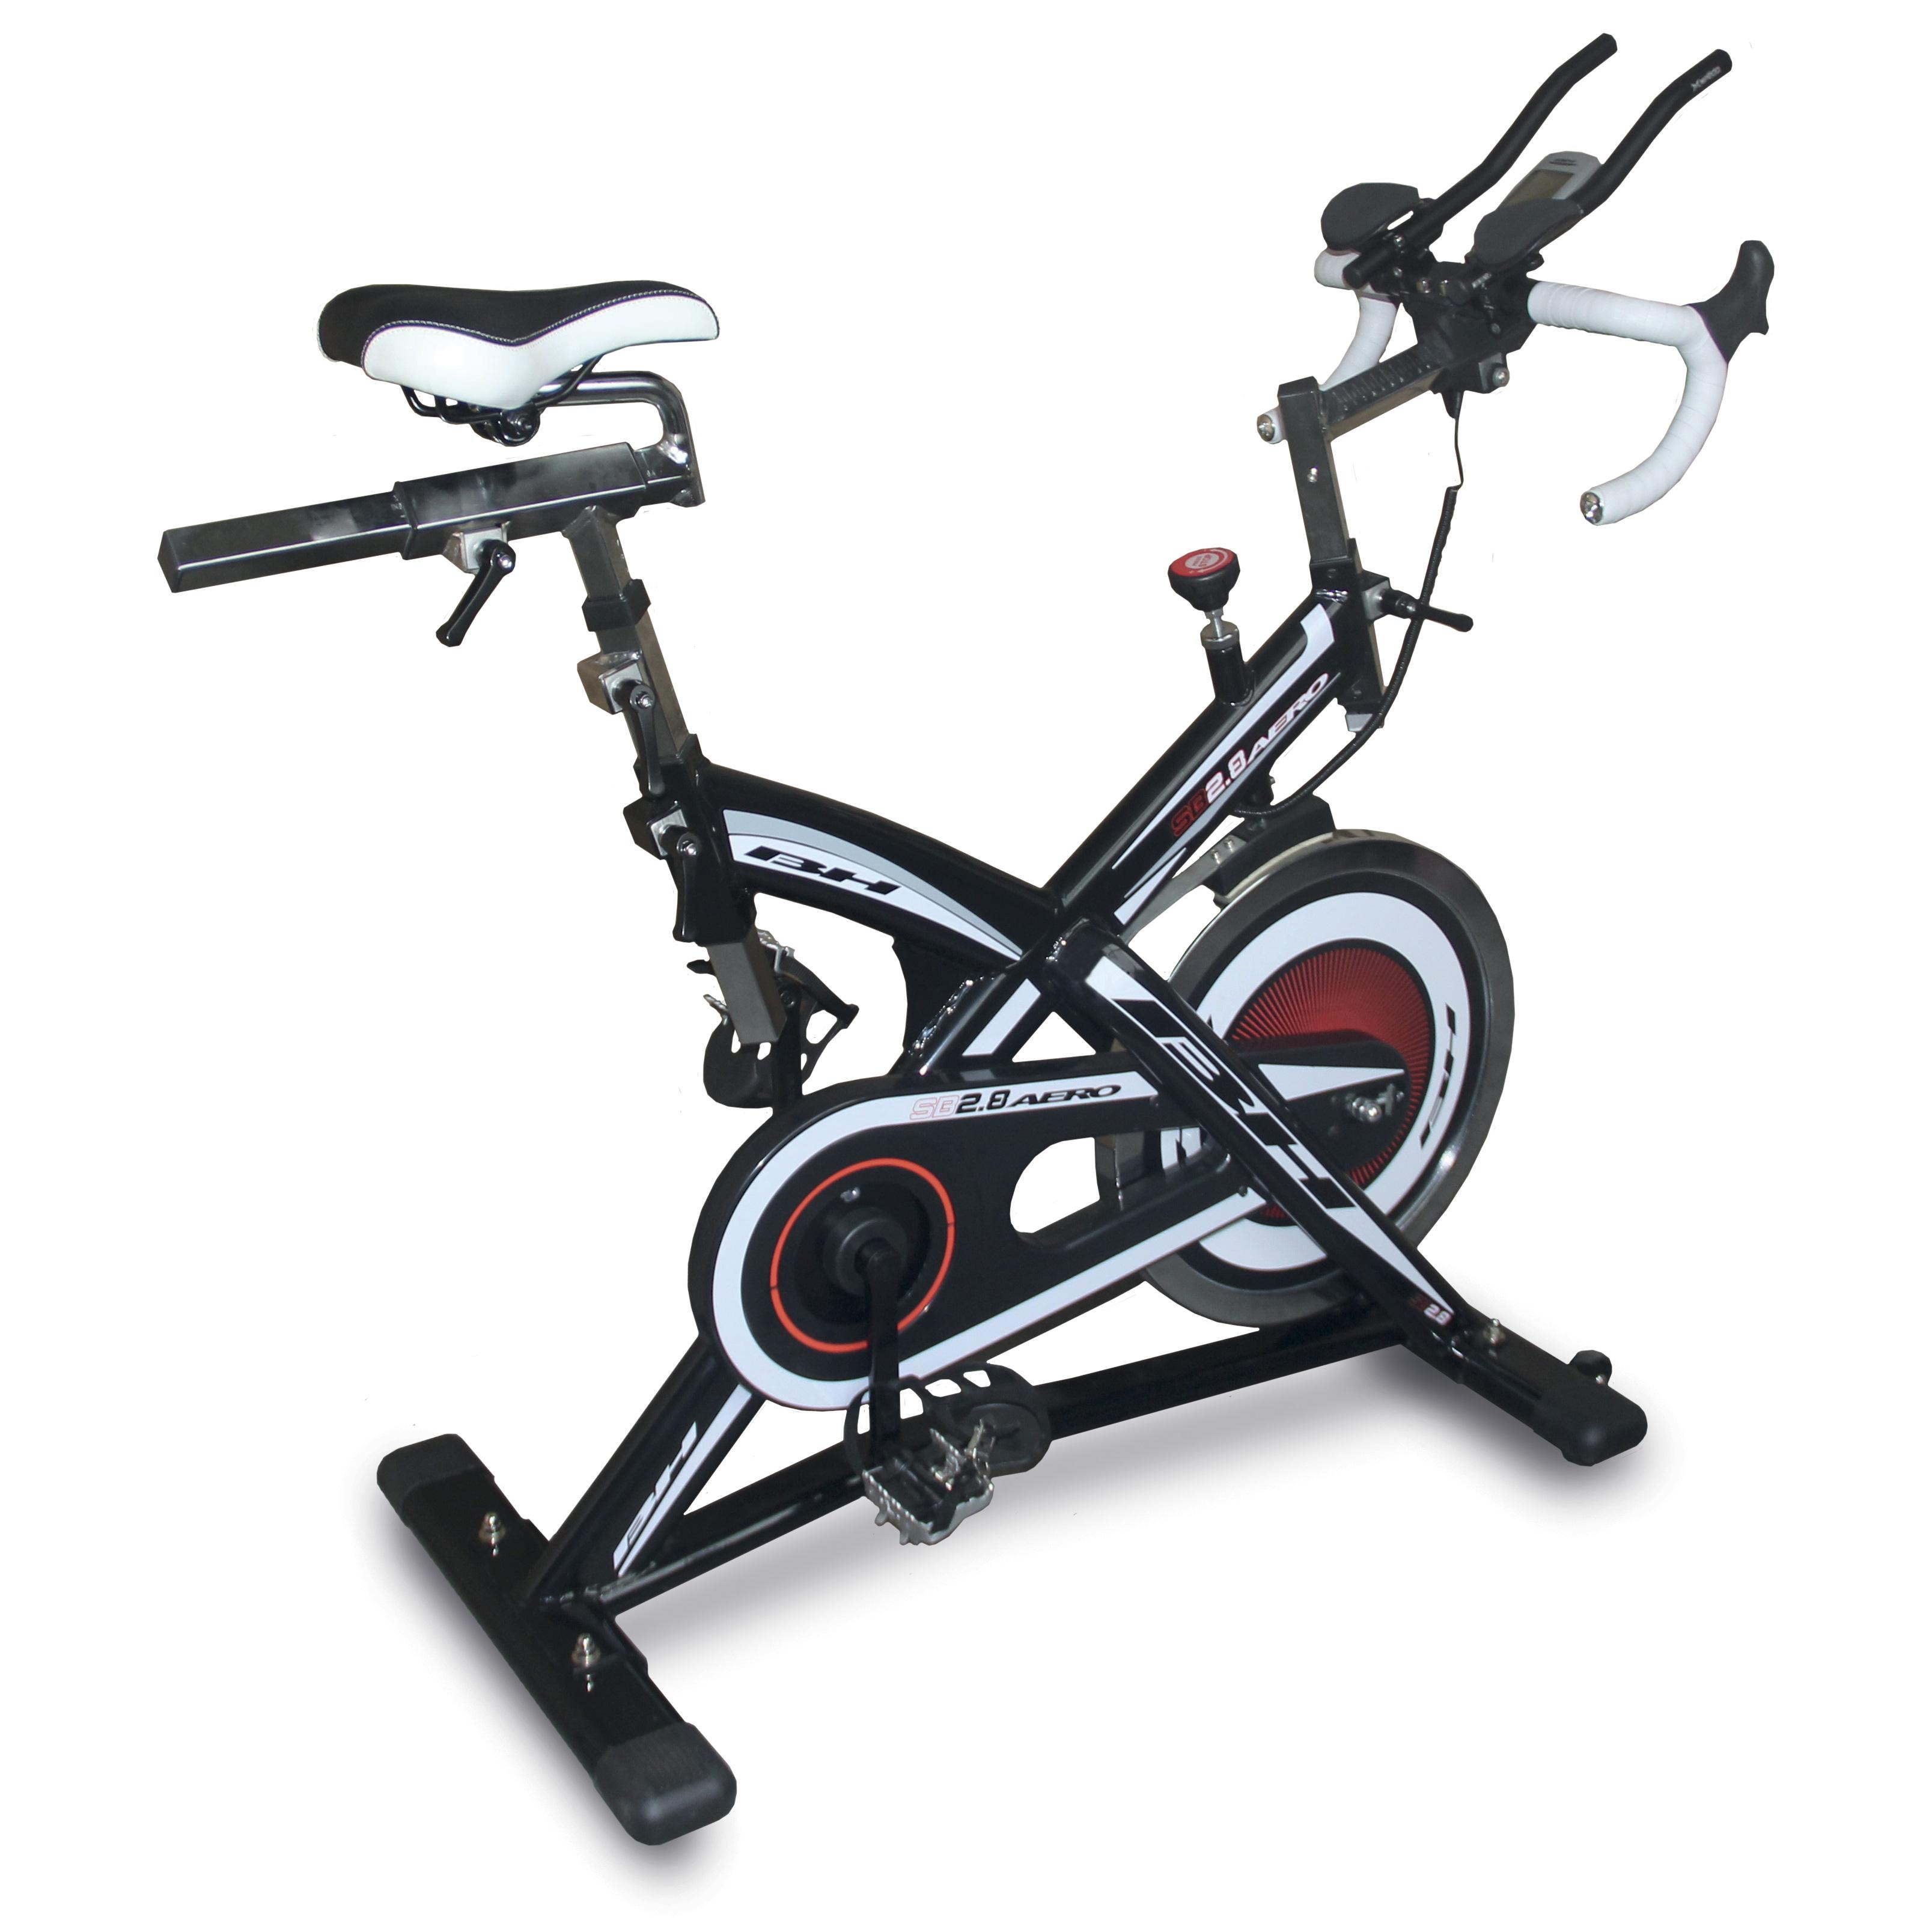 Bh fitness SB2.8 AERO